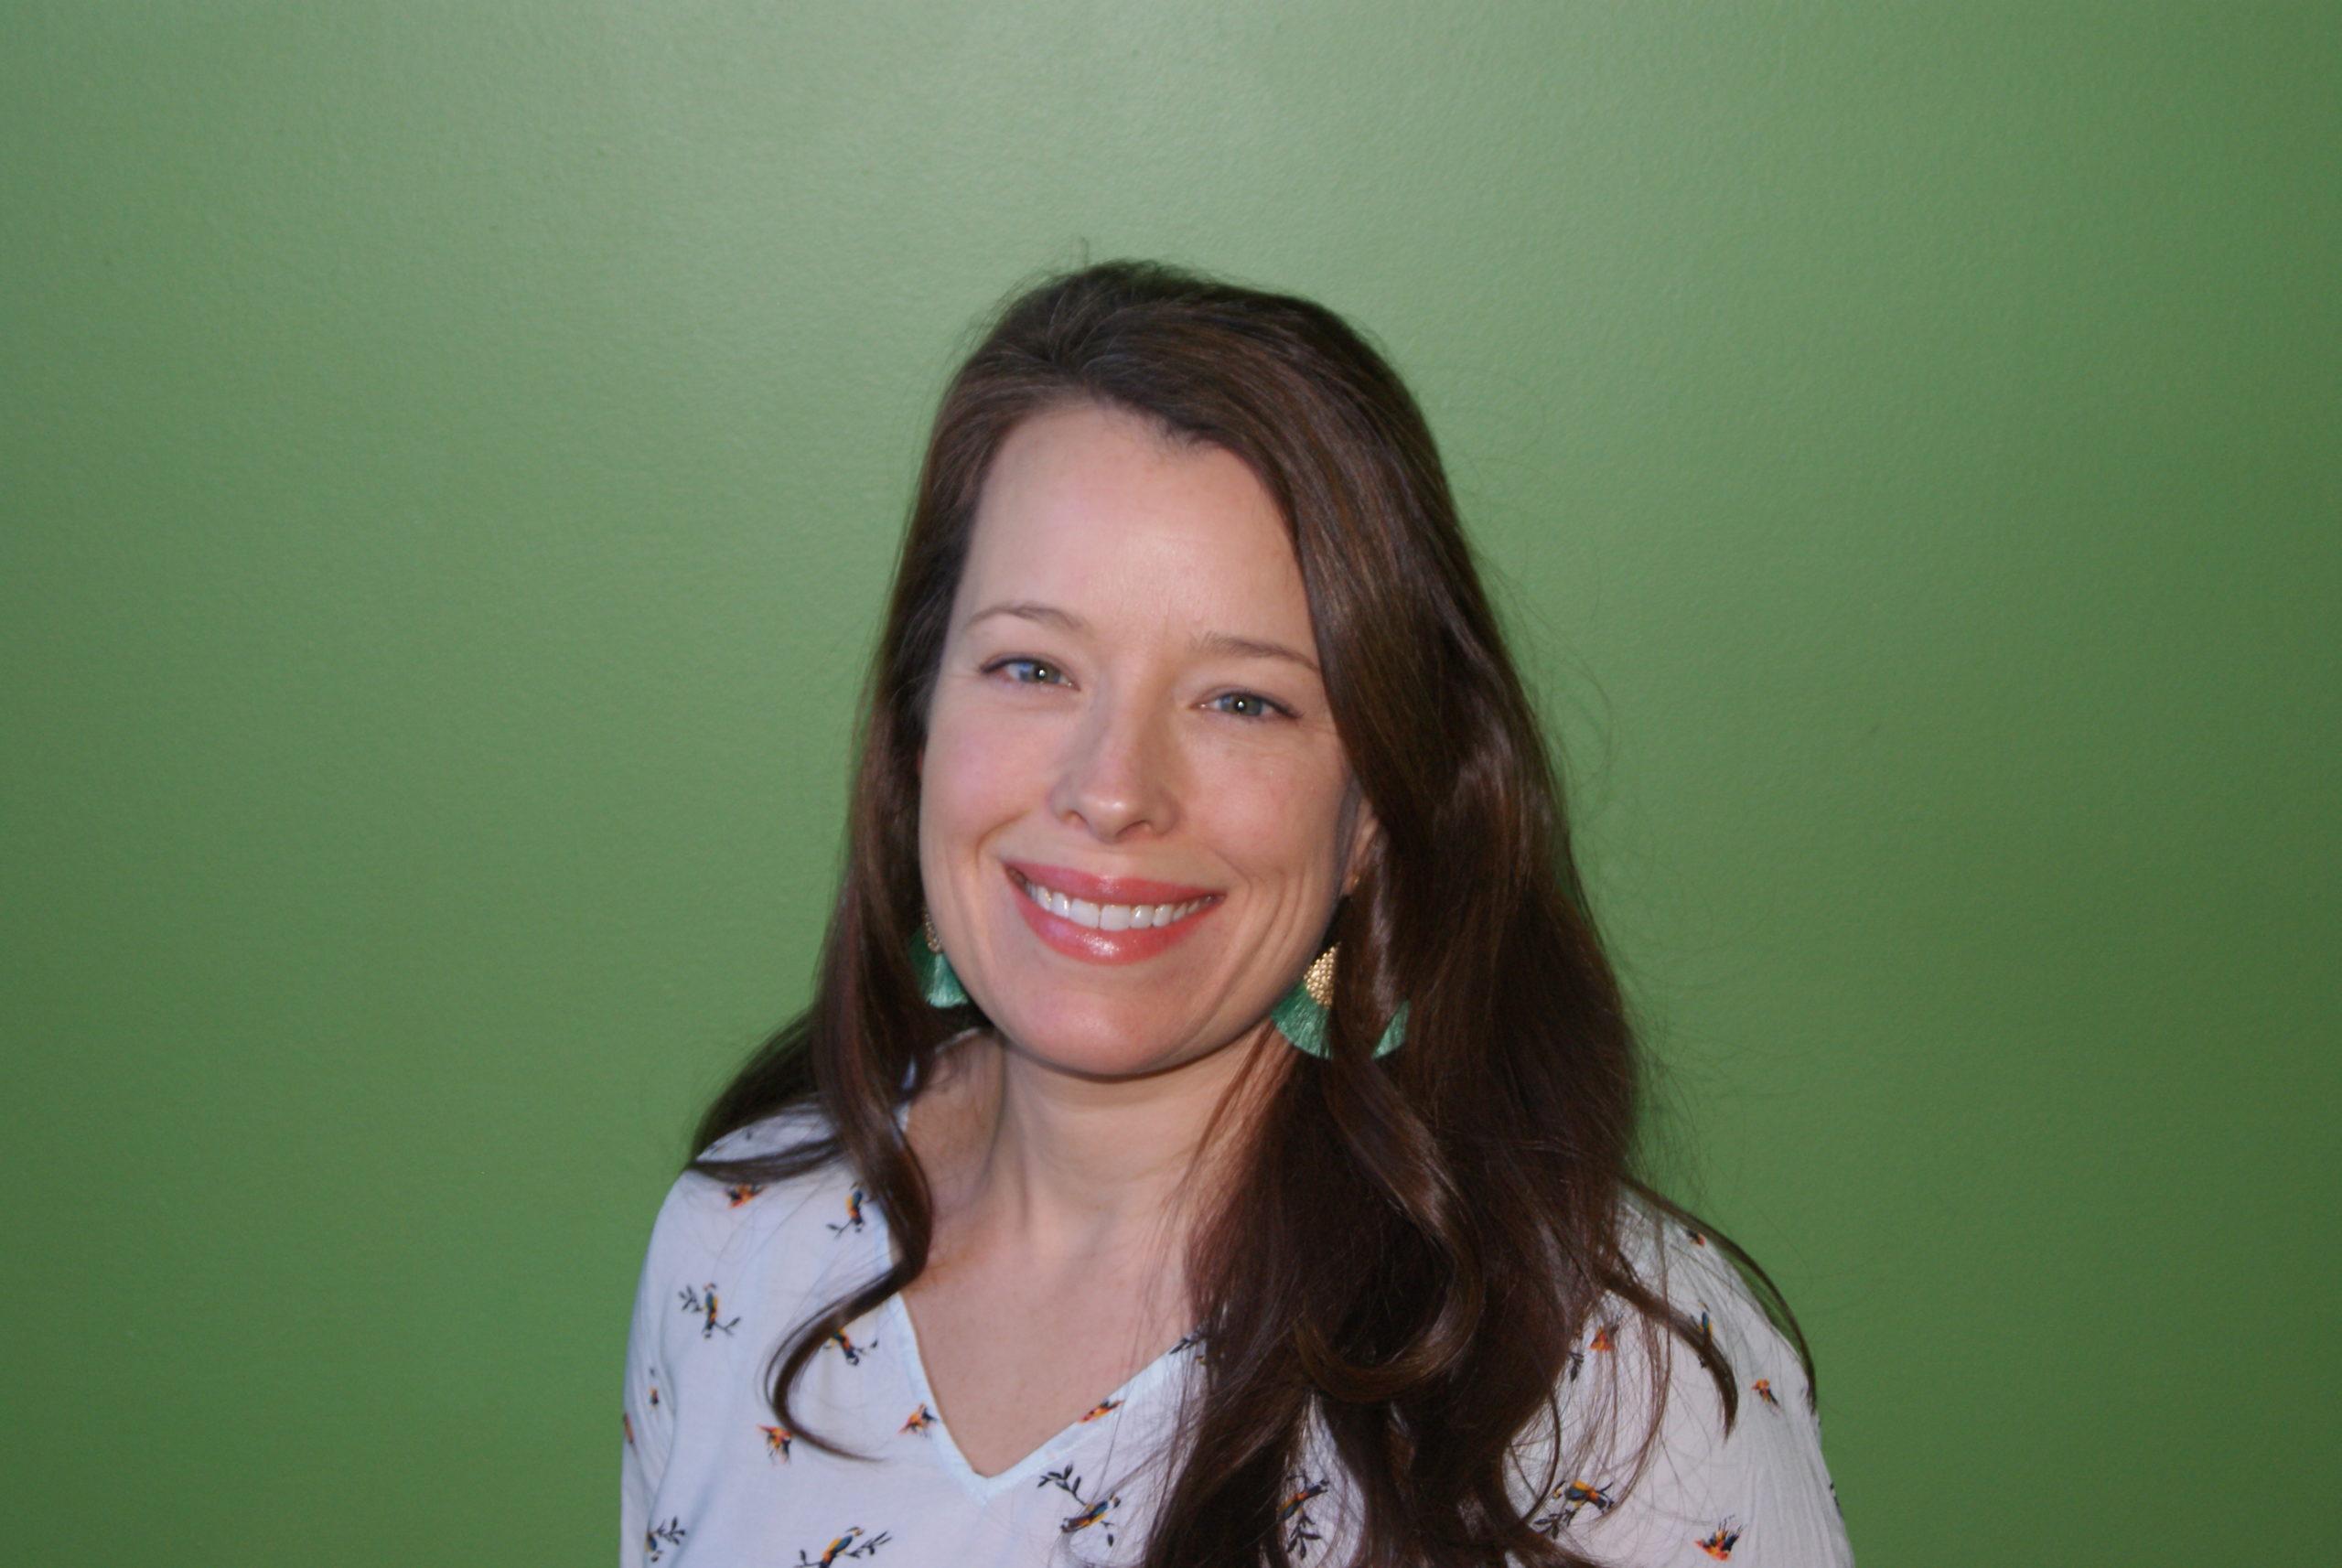 Photo of Sarah Volling